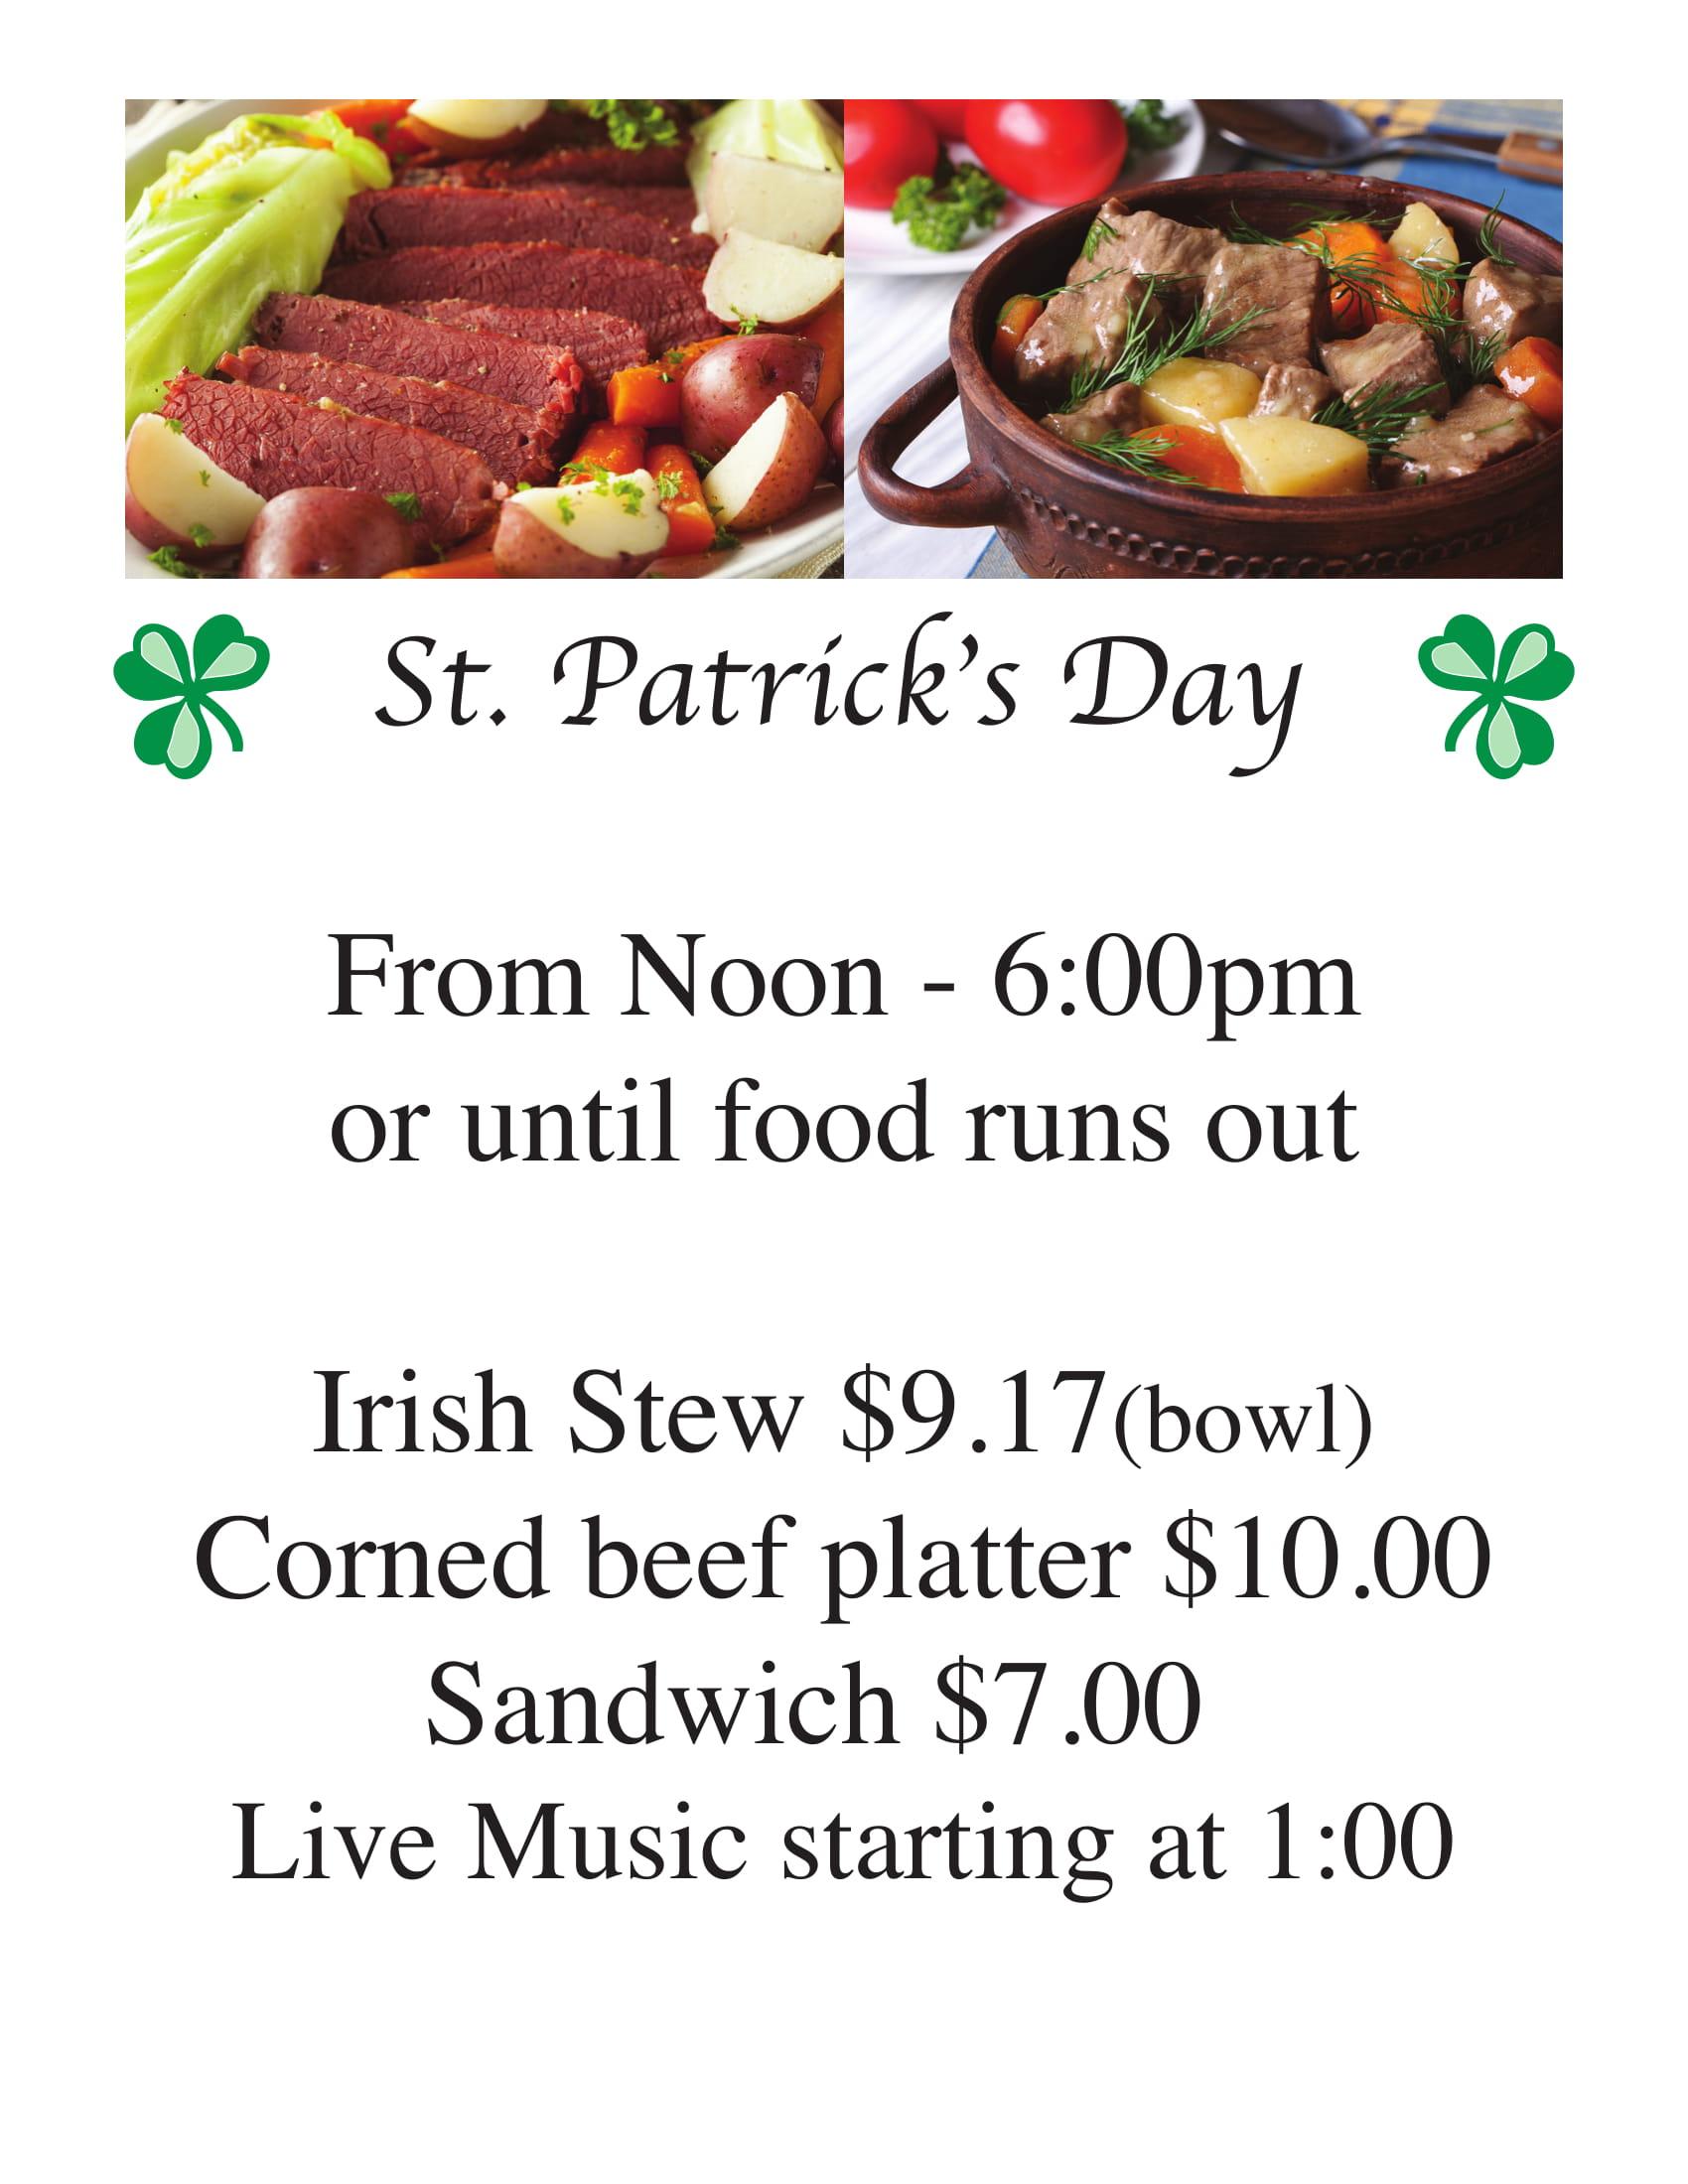 469 St. Patrick's day-1